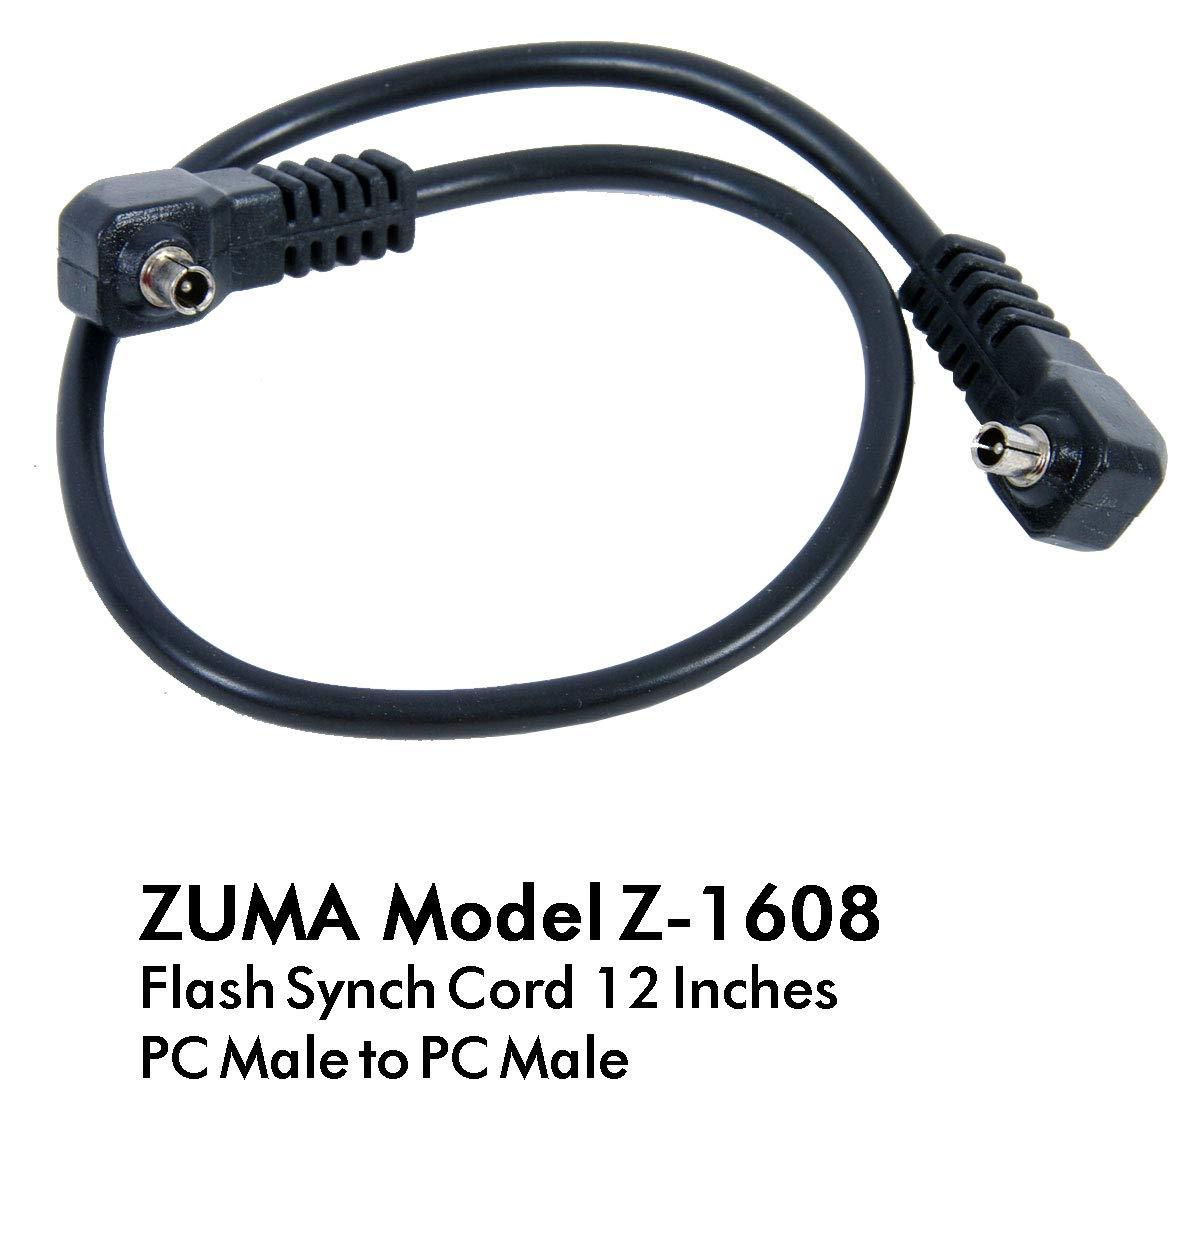 Black ZUMA PHOTO.VIDEO Z-1640 Flash Sync Cord 16 3.5mm Miniphone to PC Male